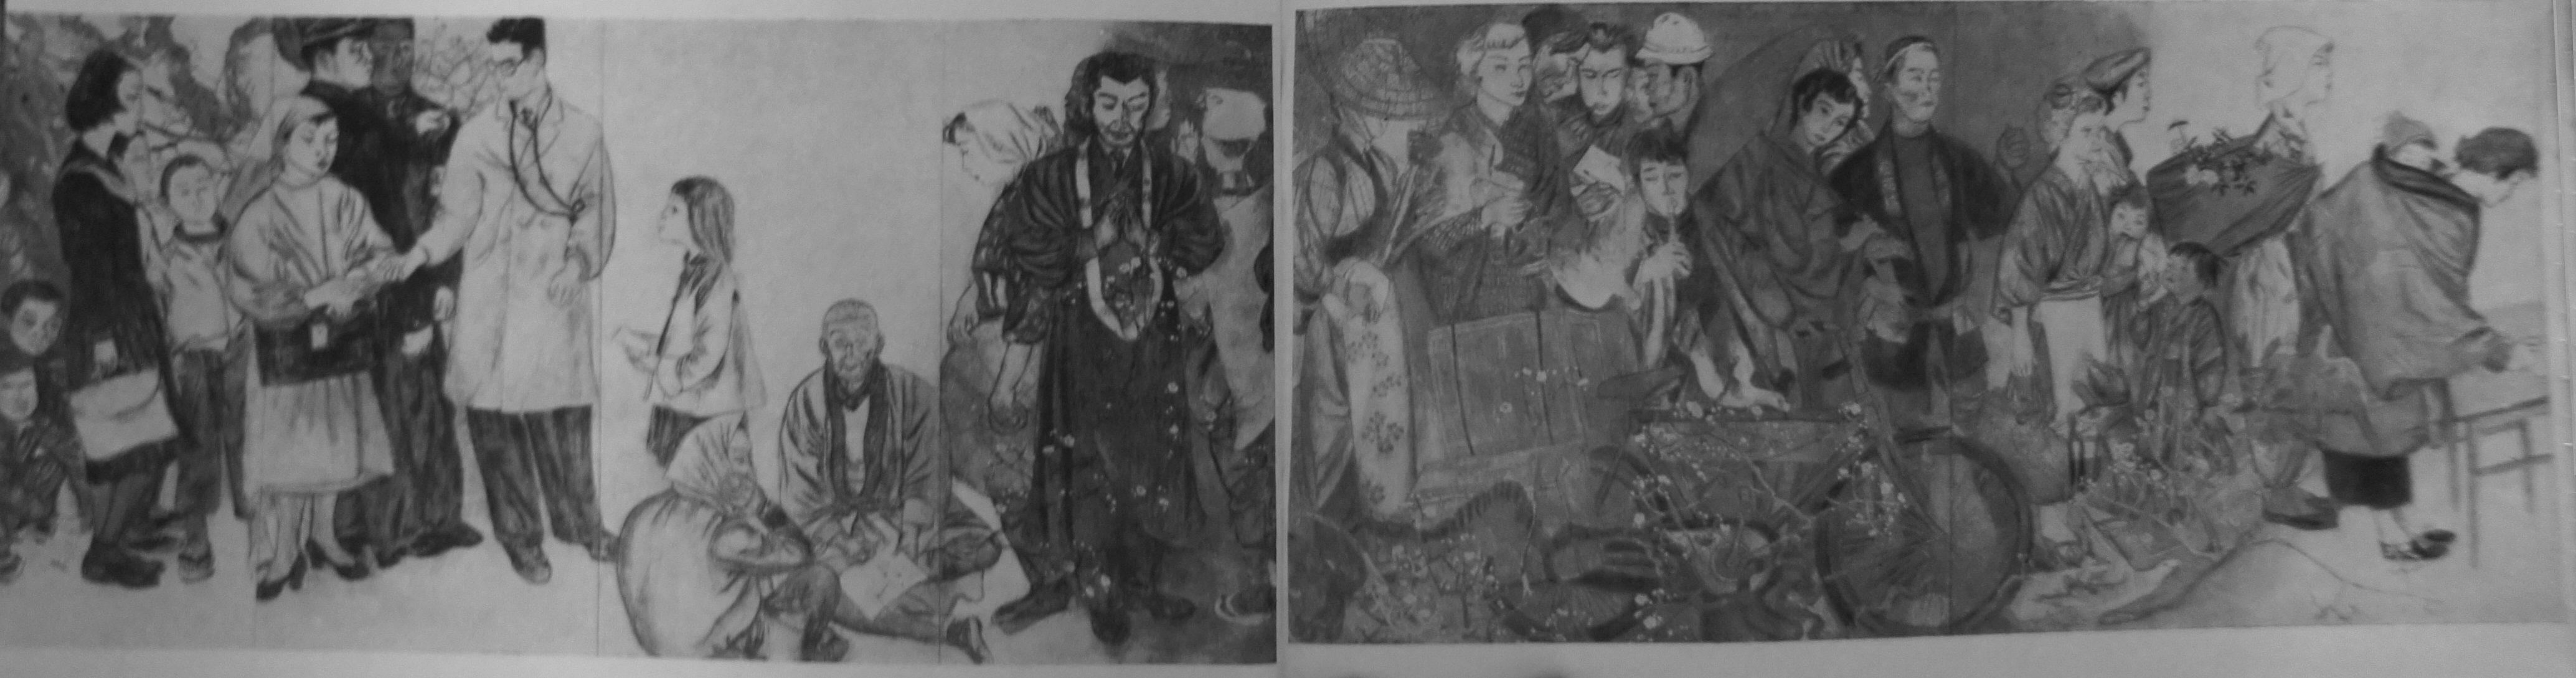 "Ири и Тосико Маруки. ""Петиция"" или ""Сбор подписей"". 1955 год."